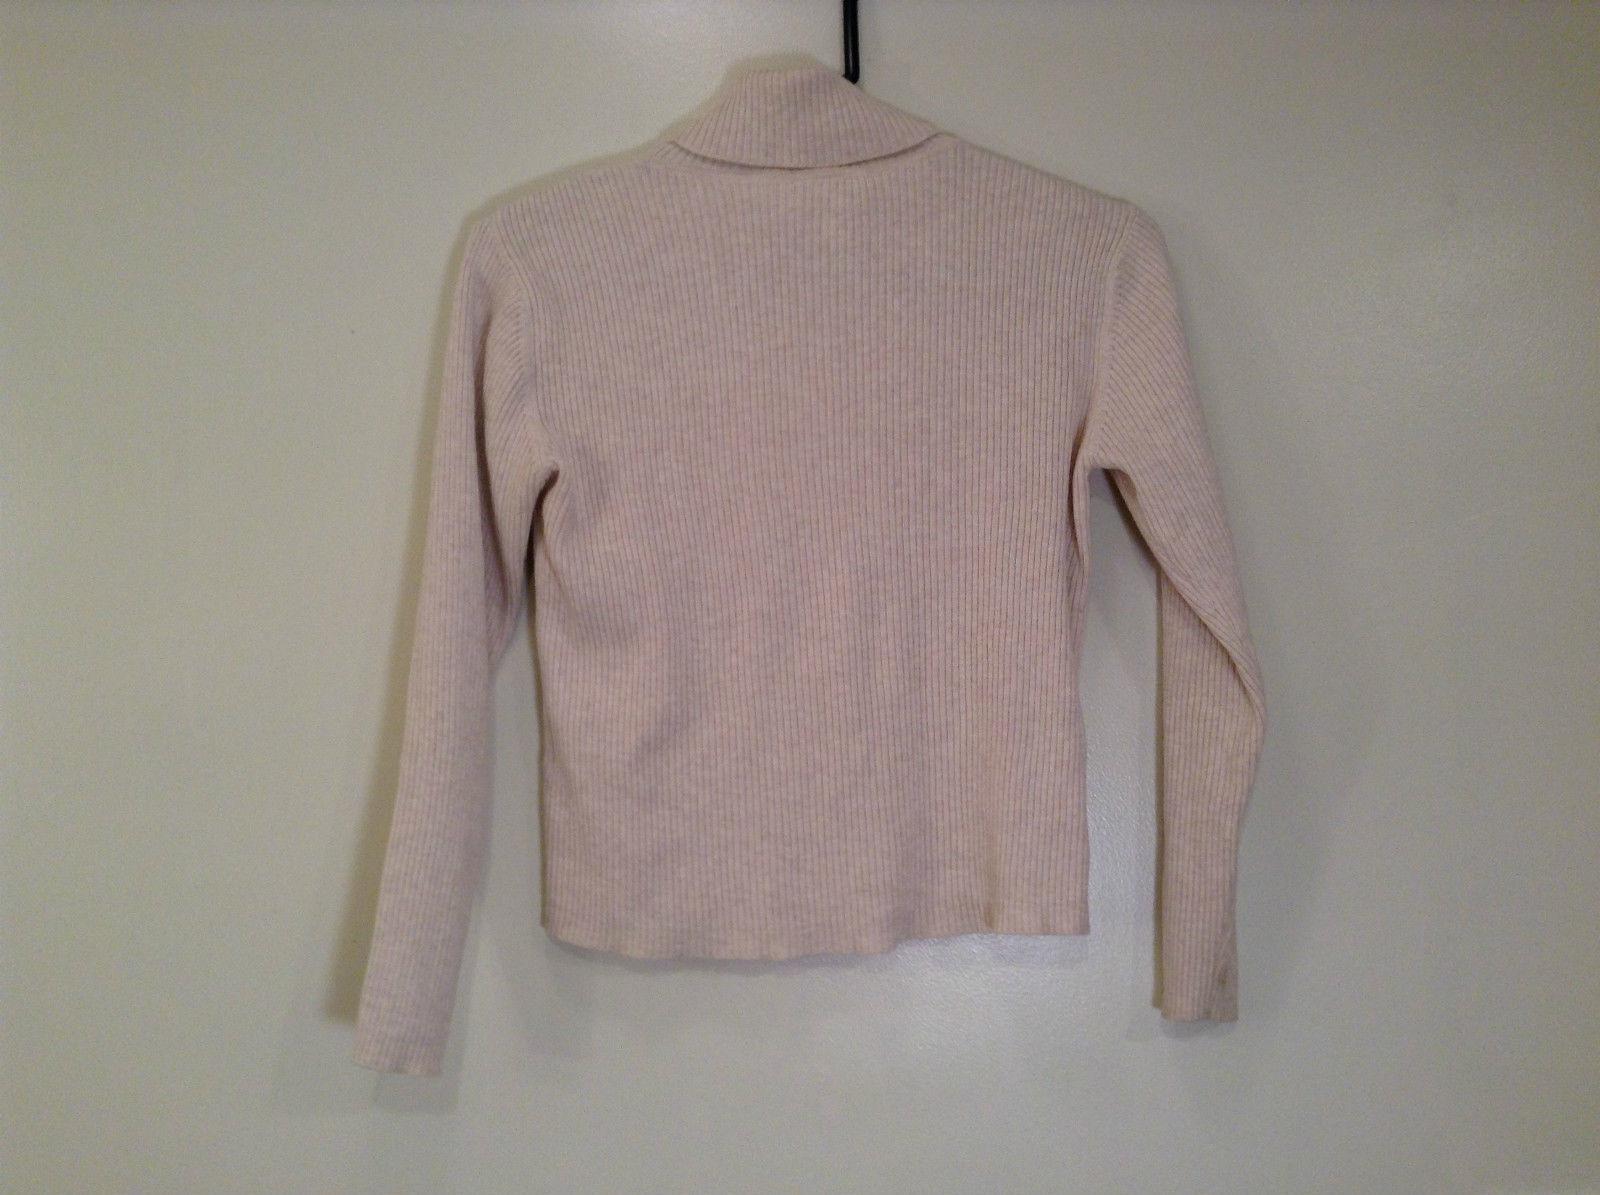 Beige Talbots Petites Long Sleeve Turtleneck Sweater Size S Stretch Fabric